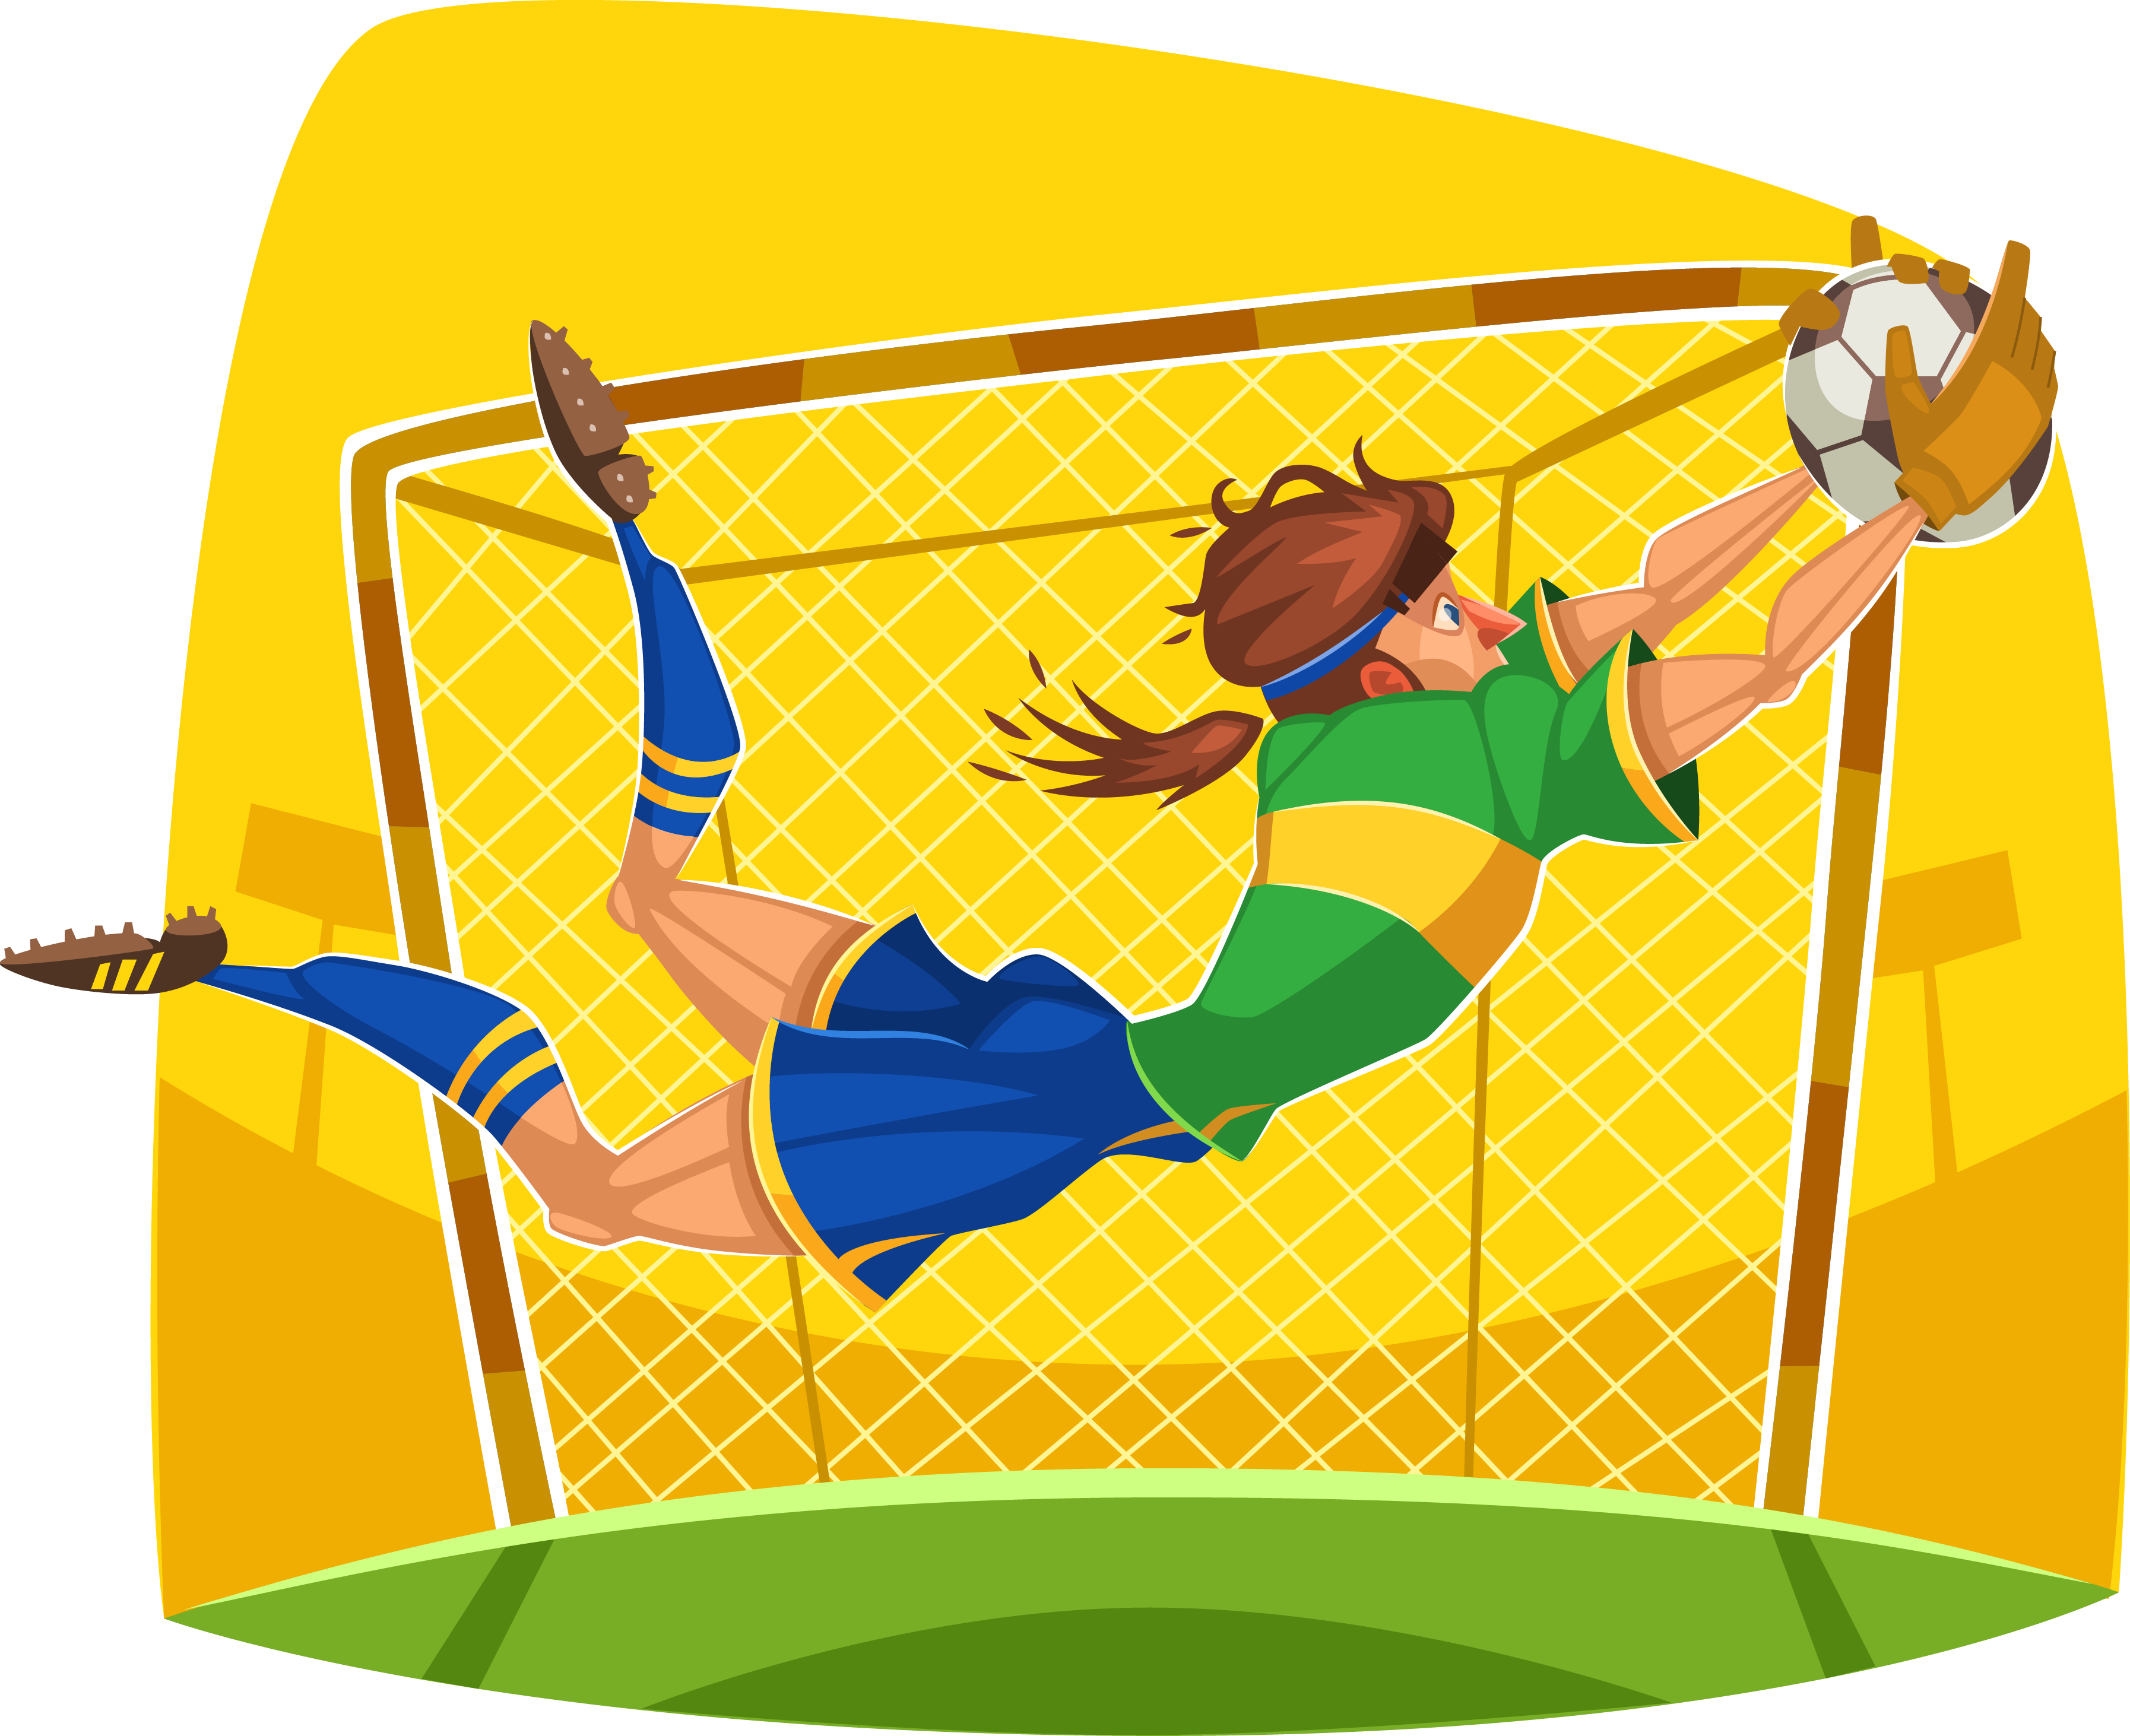 Football field background clipart transparent download Cartoon Sport Clip art - football 3588*2925 transprent Png Free ... transparent download